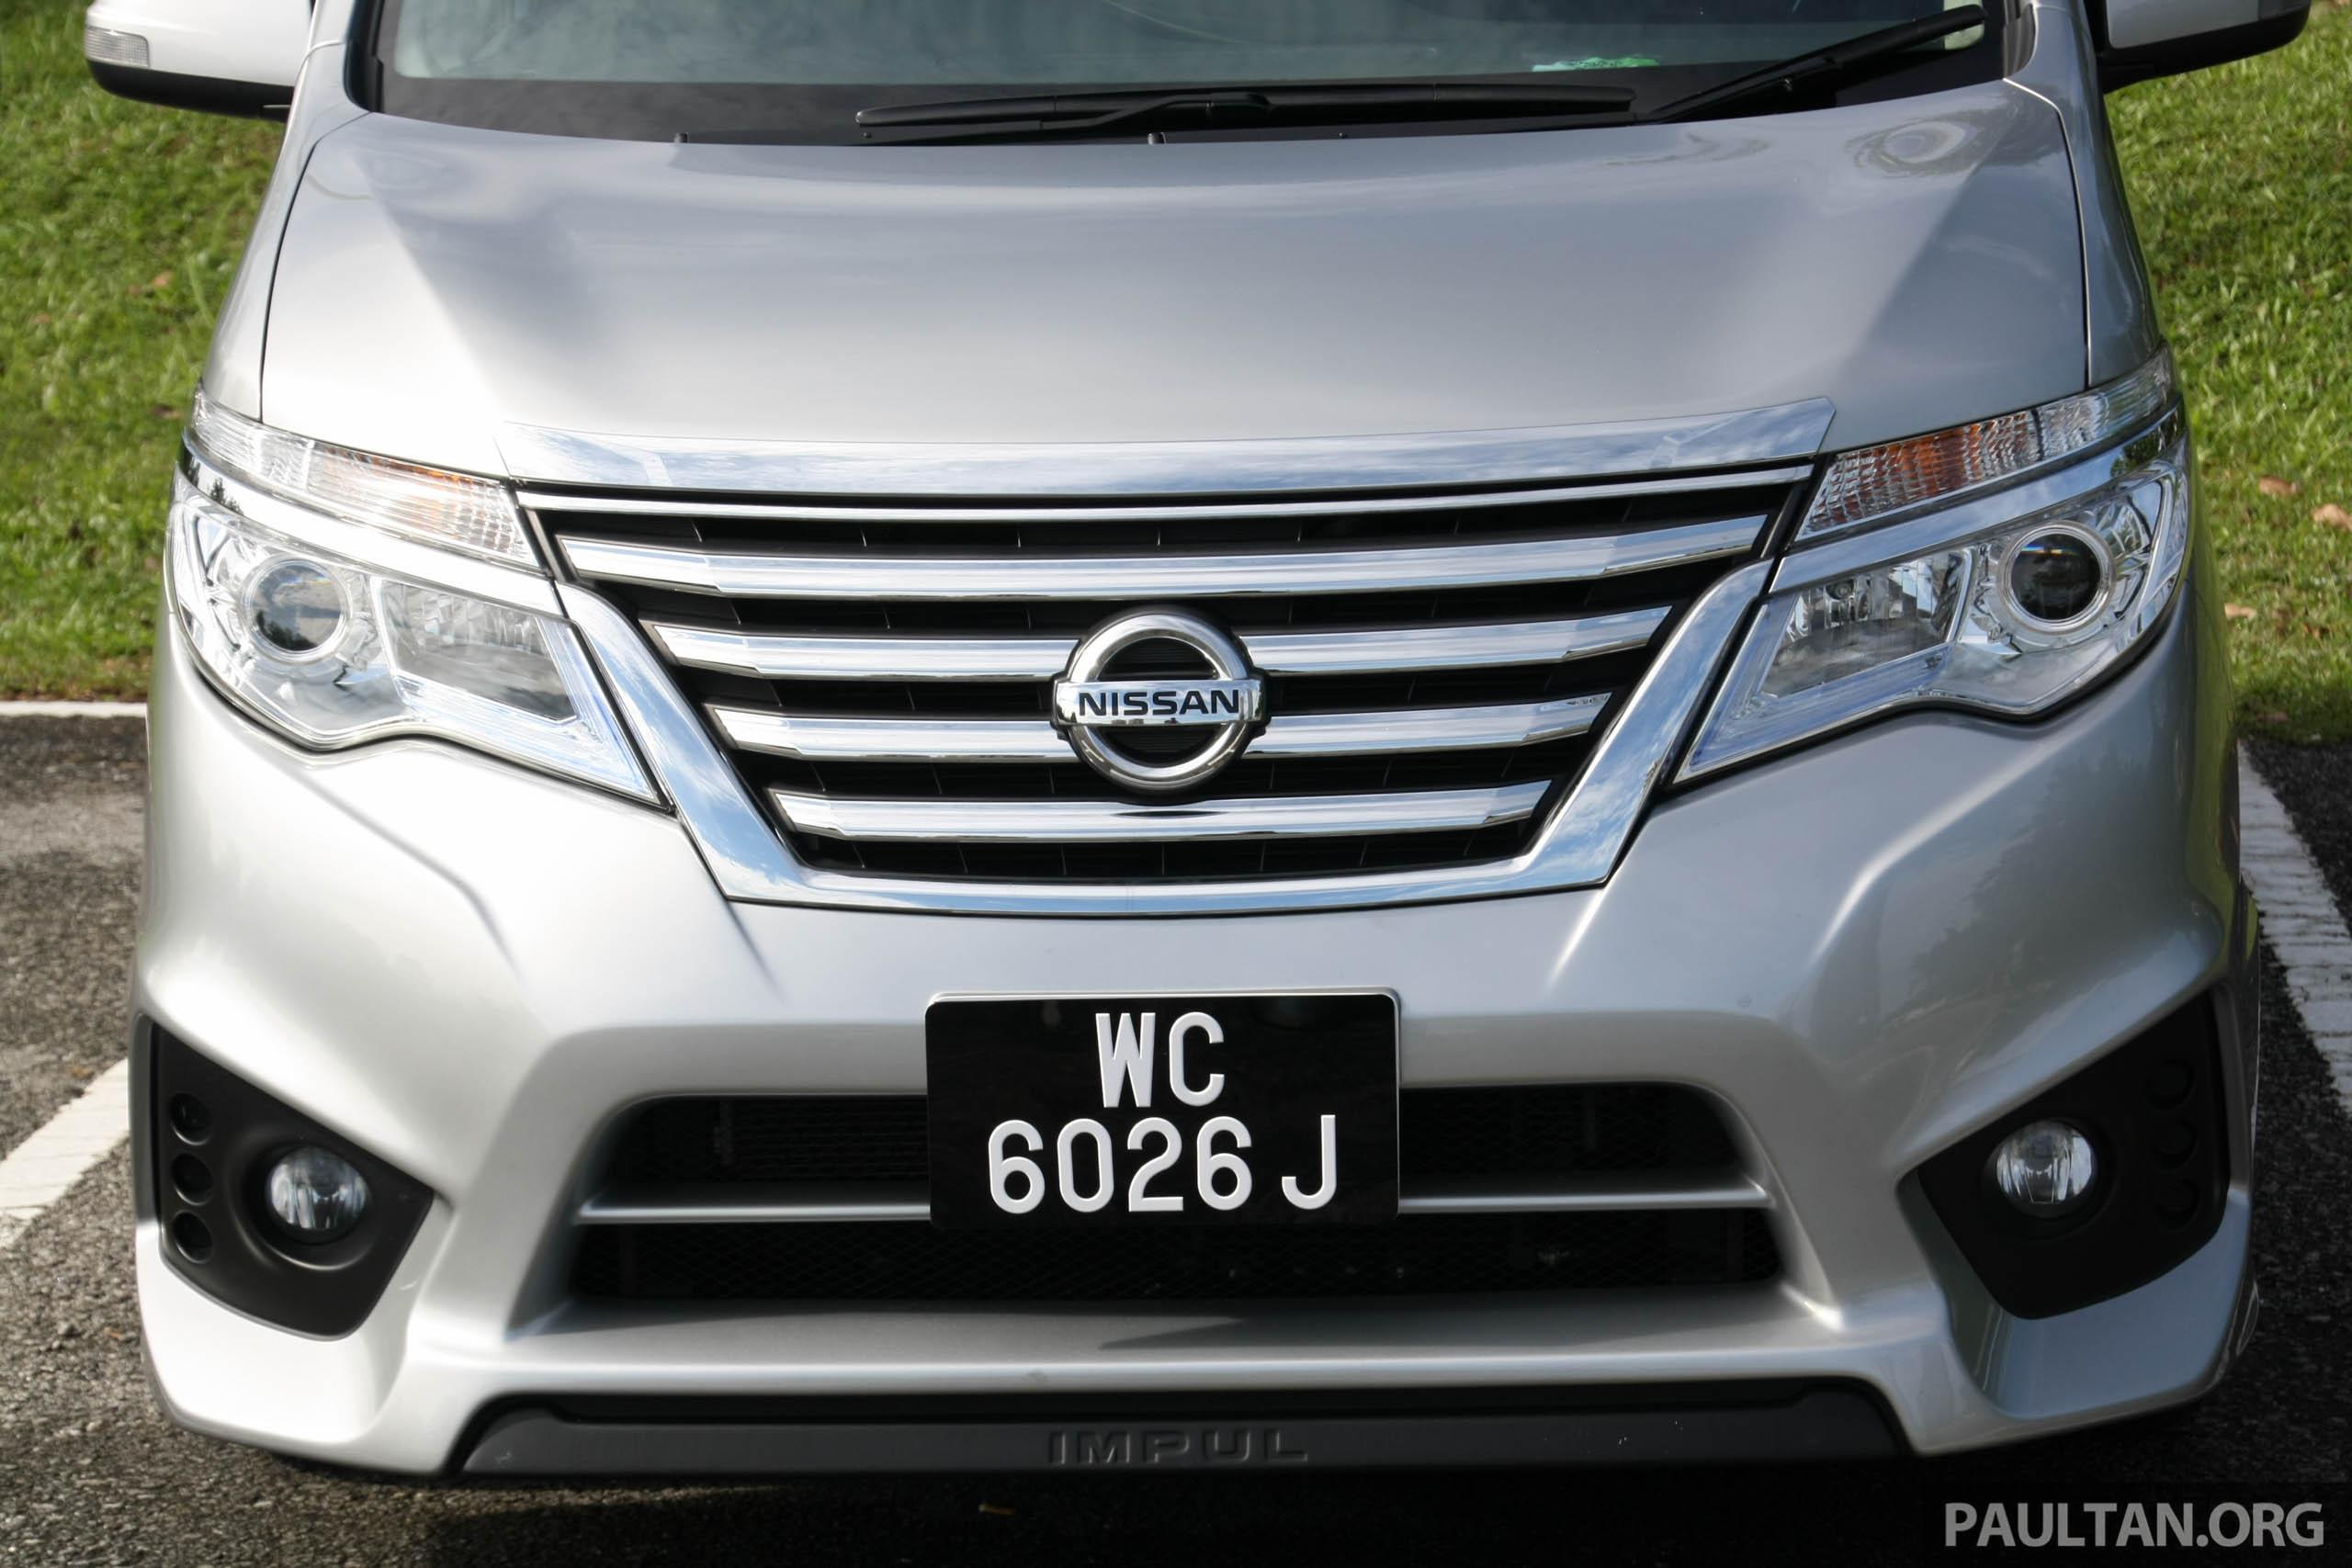 GALERI: Nissan Serena S-Hybrid Talaan Impul Paul Tan ...